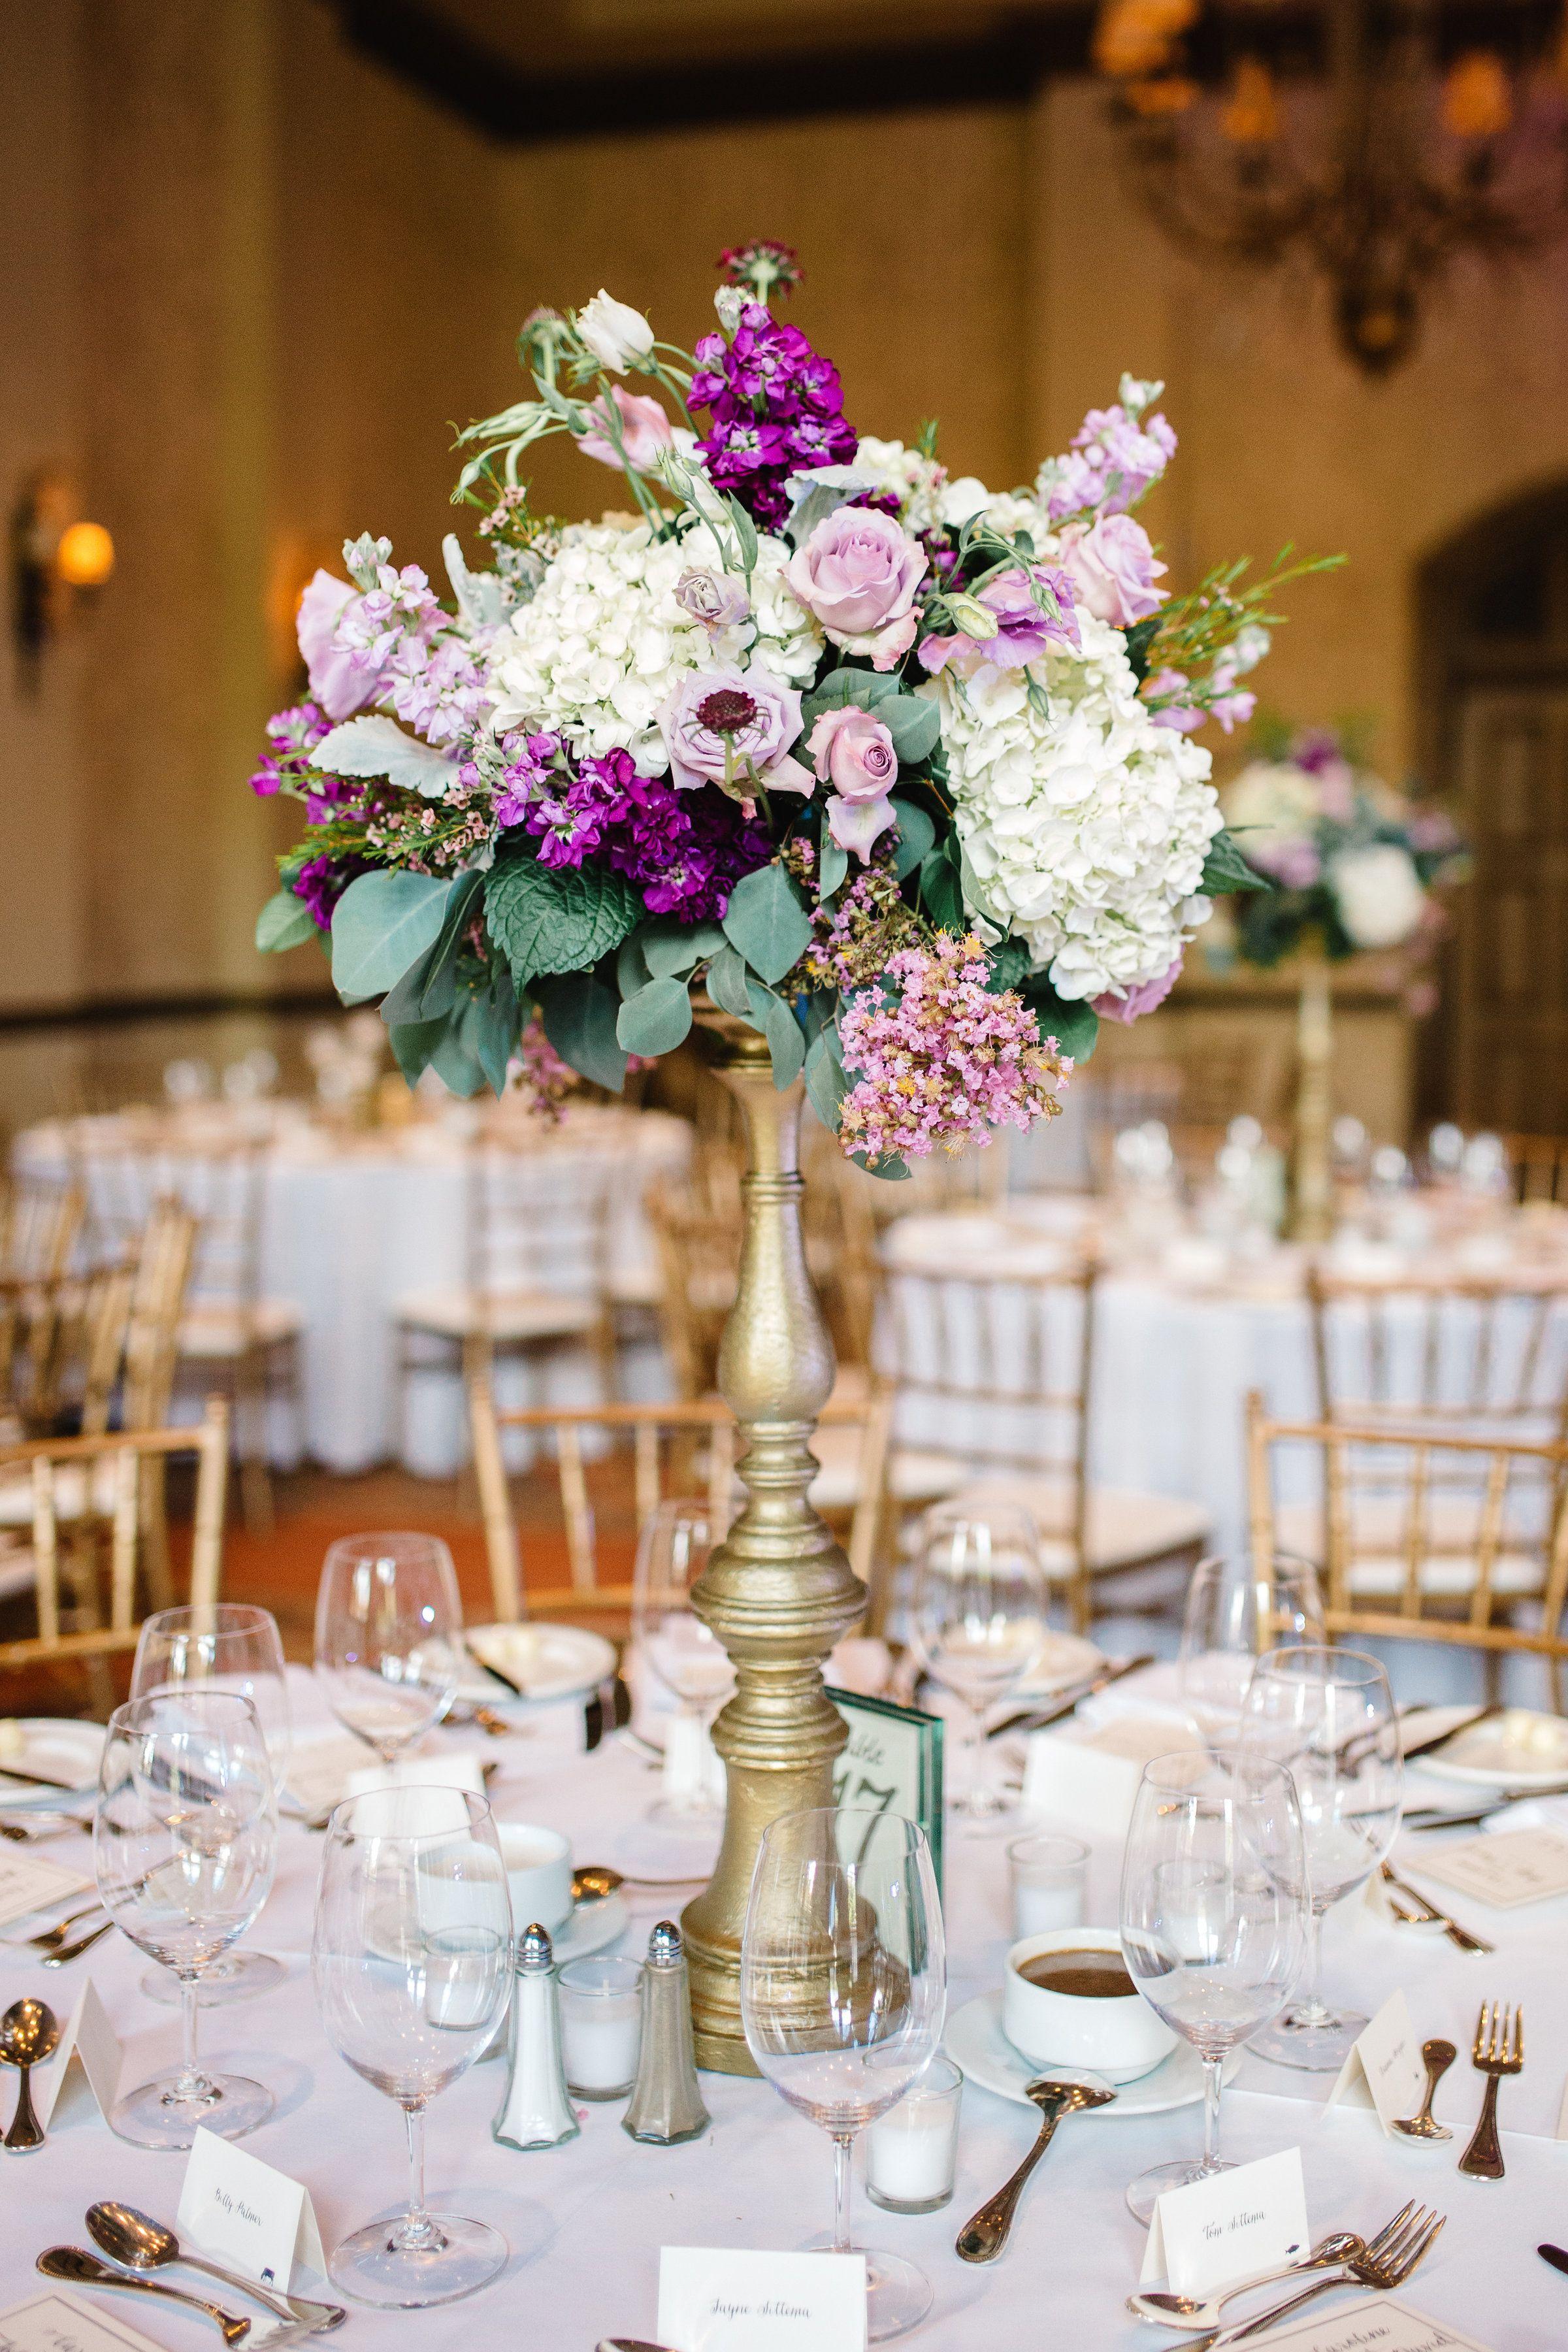 Wedding Reception Centerpiece Of White Hydrangea Lavender Roses